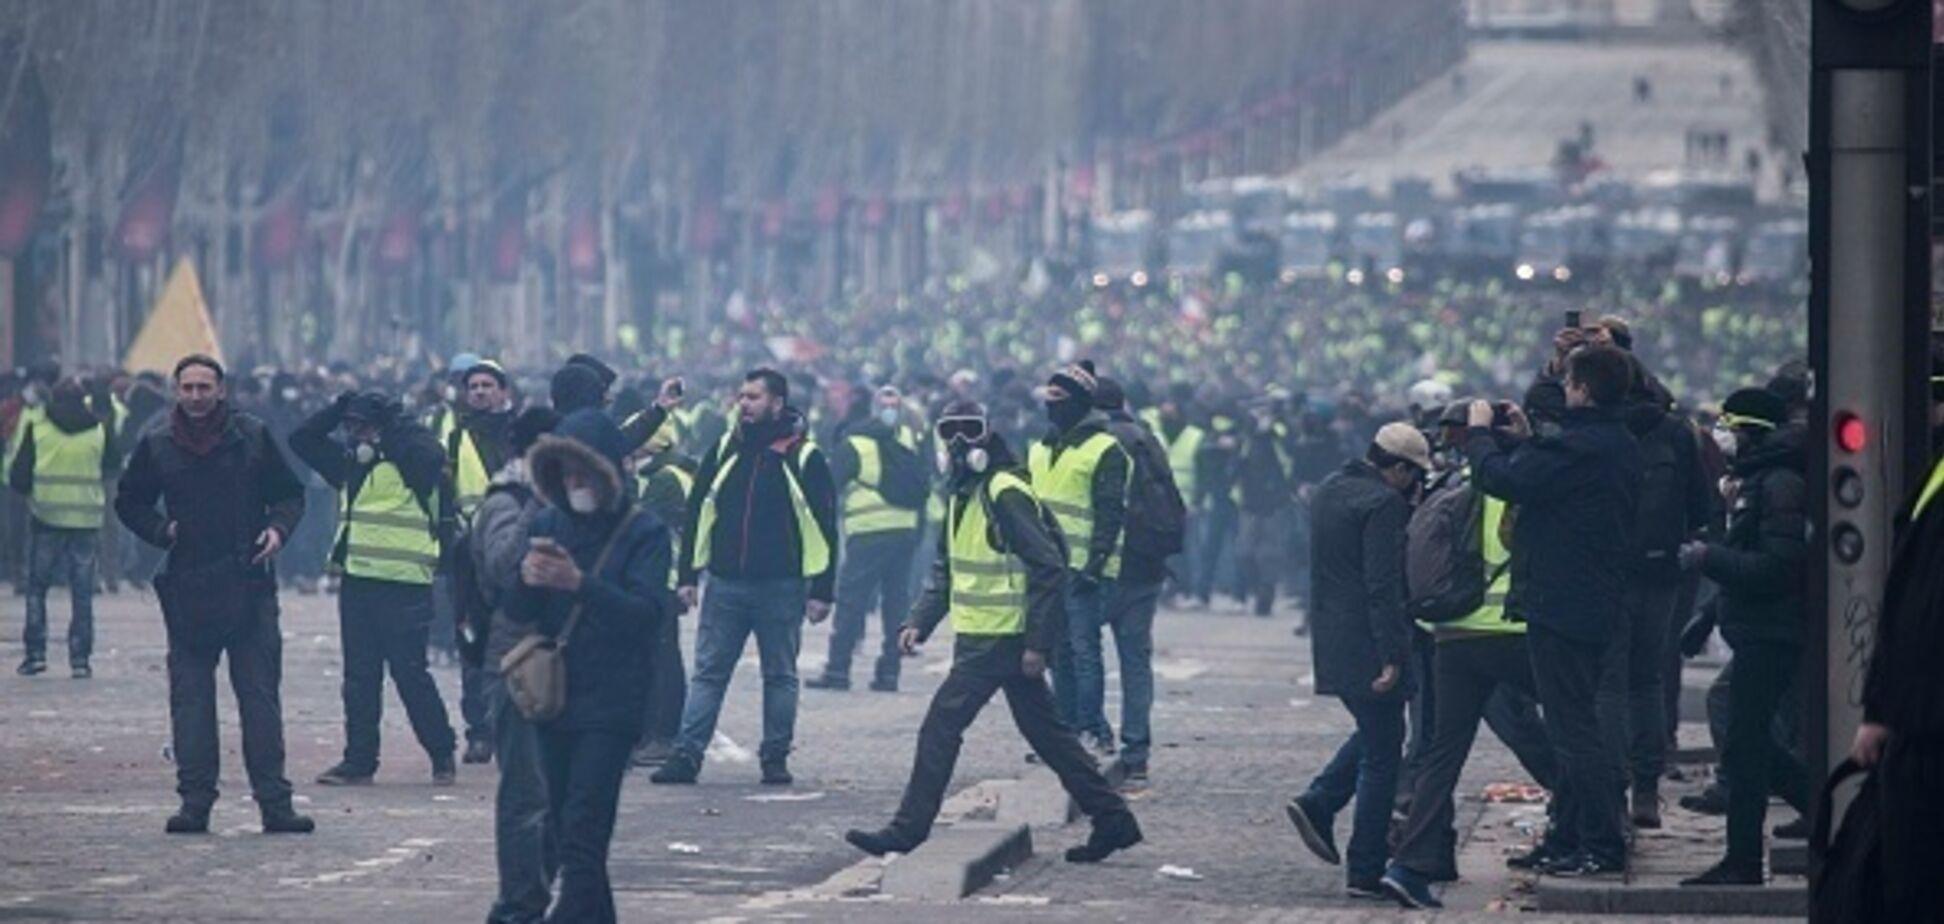 Франция против мигрантов: россиянин озвучил прогноз по развалу Европы